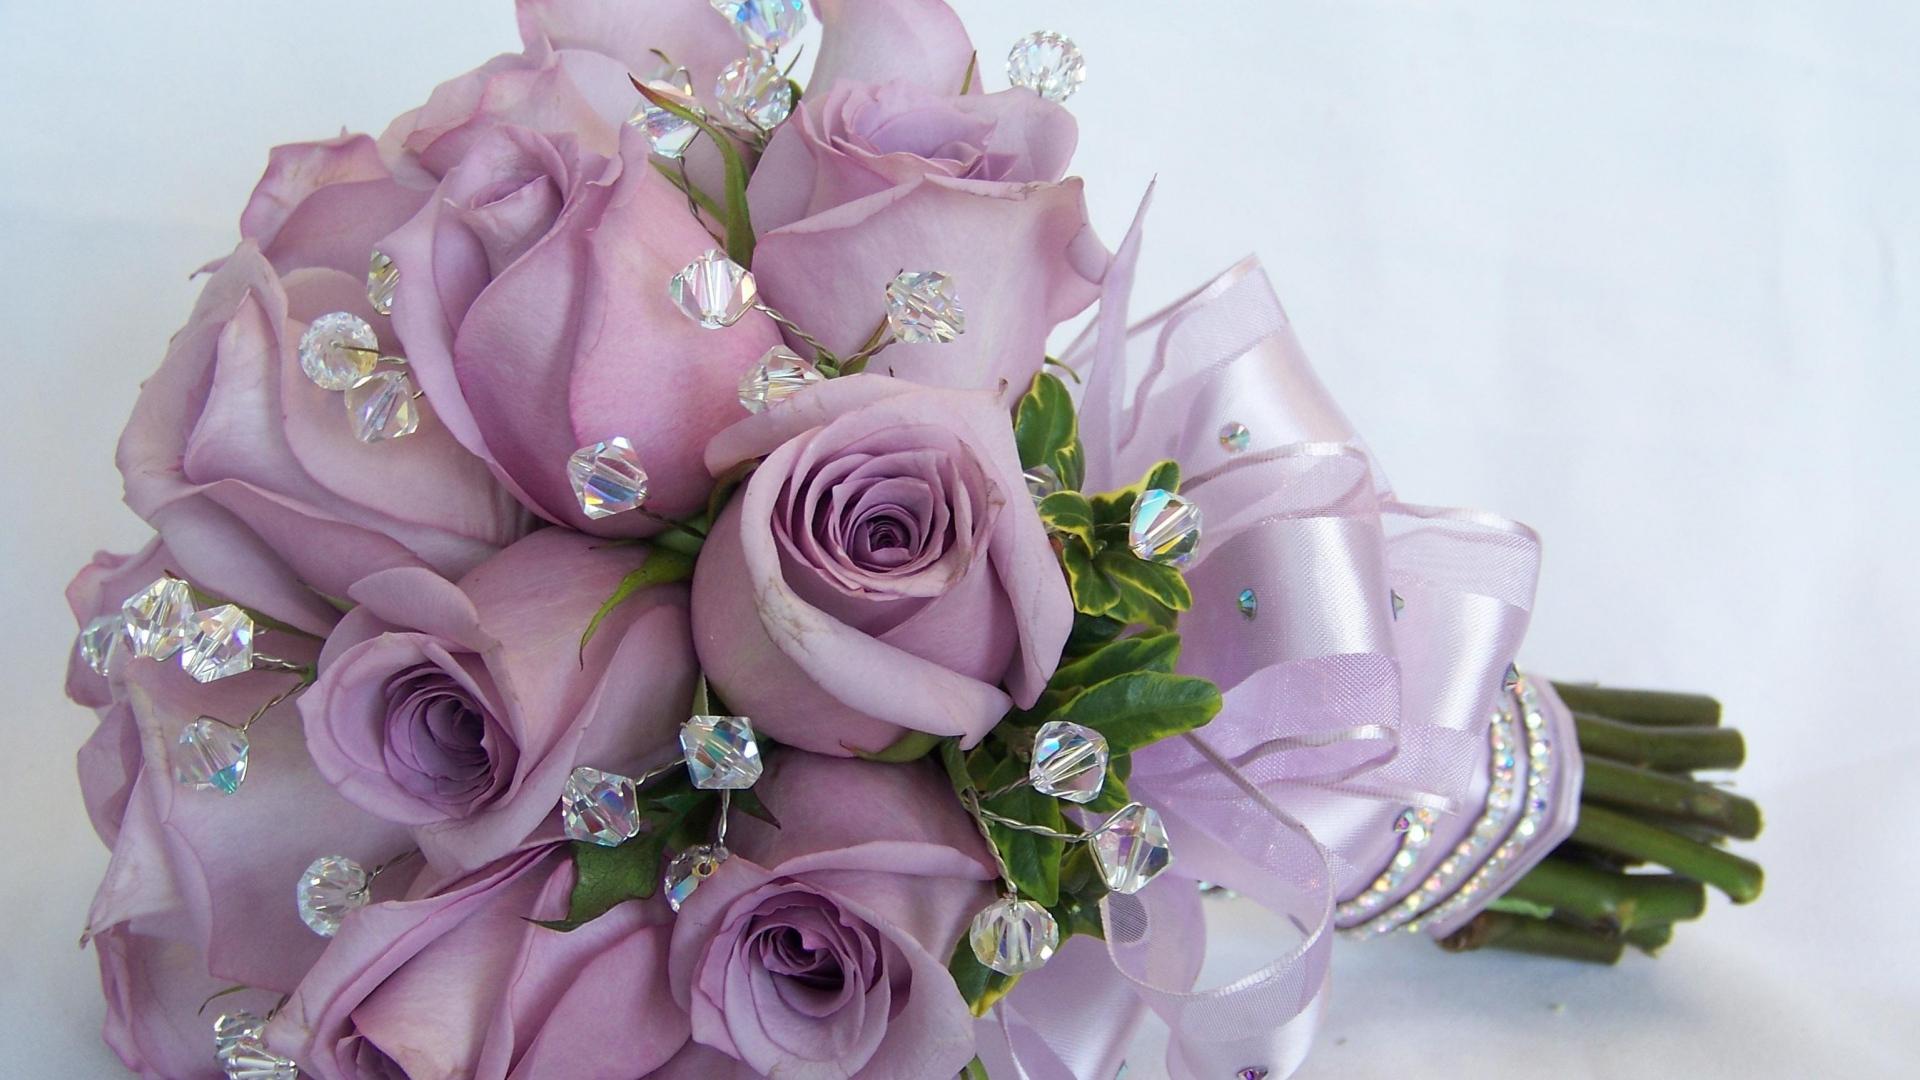 Purple Roses In A Wedding Bouquet Desktop Wallpapers 1920x1080